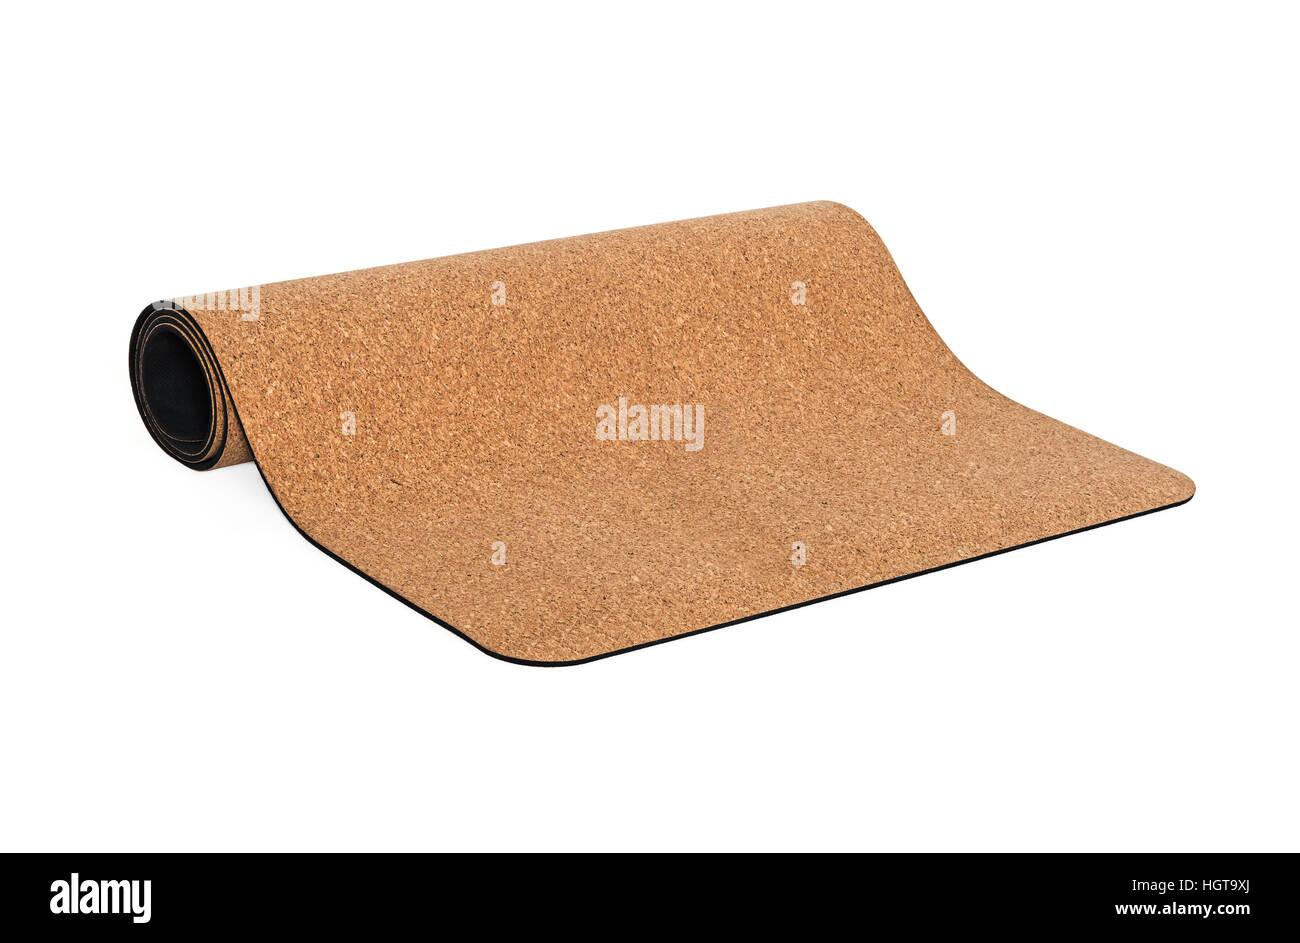 mats pk cork default khaadi abc mat